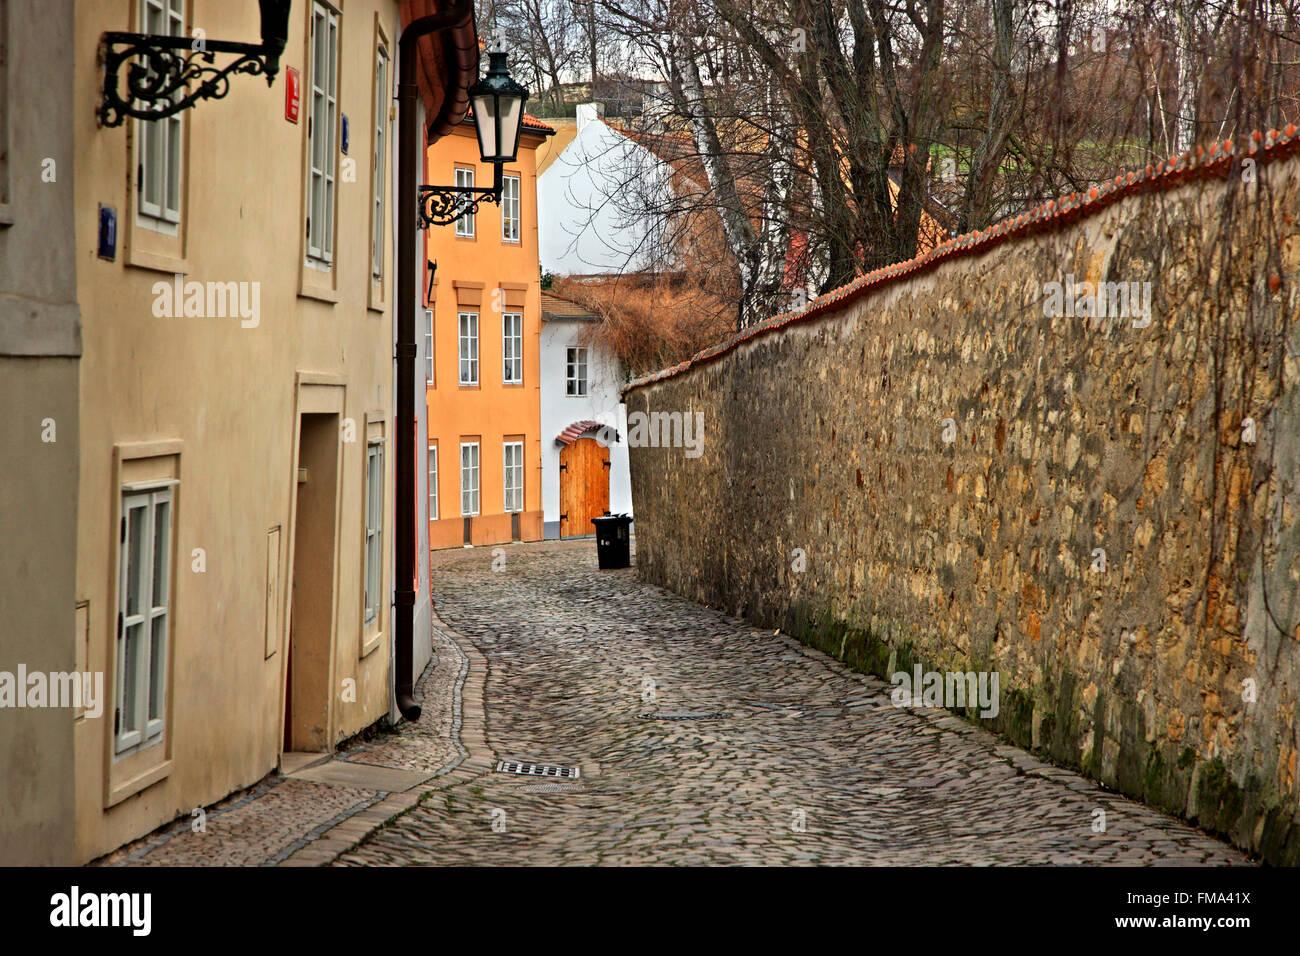 Walking in picturesque Novy Svet neighborhood, in Hradcany (Castle's neighborhood), Prague, Czech Republic Stock Photo